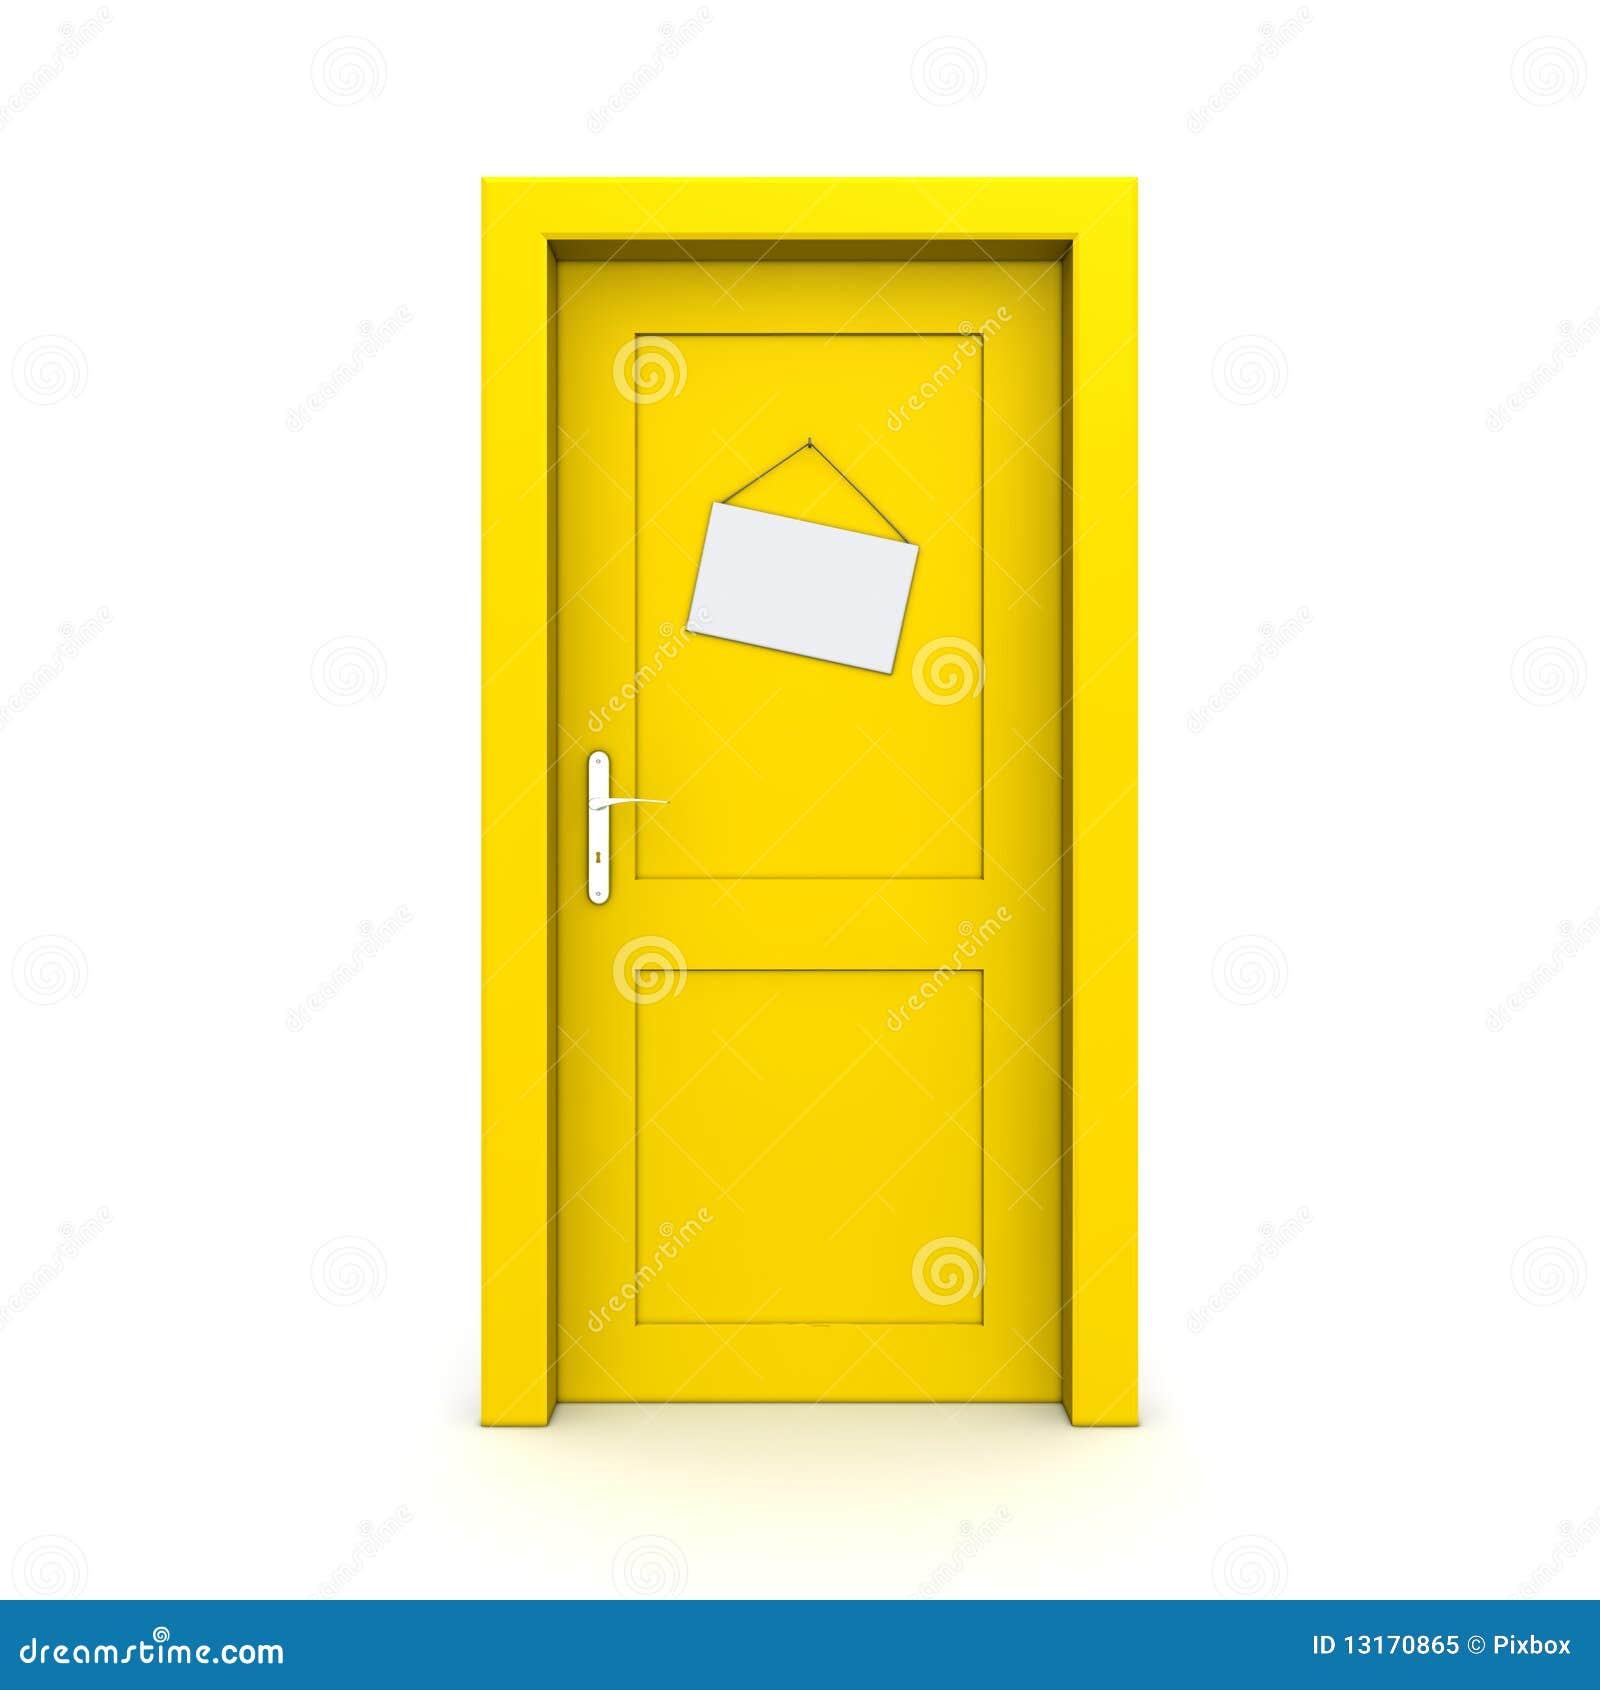 Closed Yellow Door With Dummy Door Sign Royalty Free Stock Photo ...